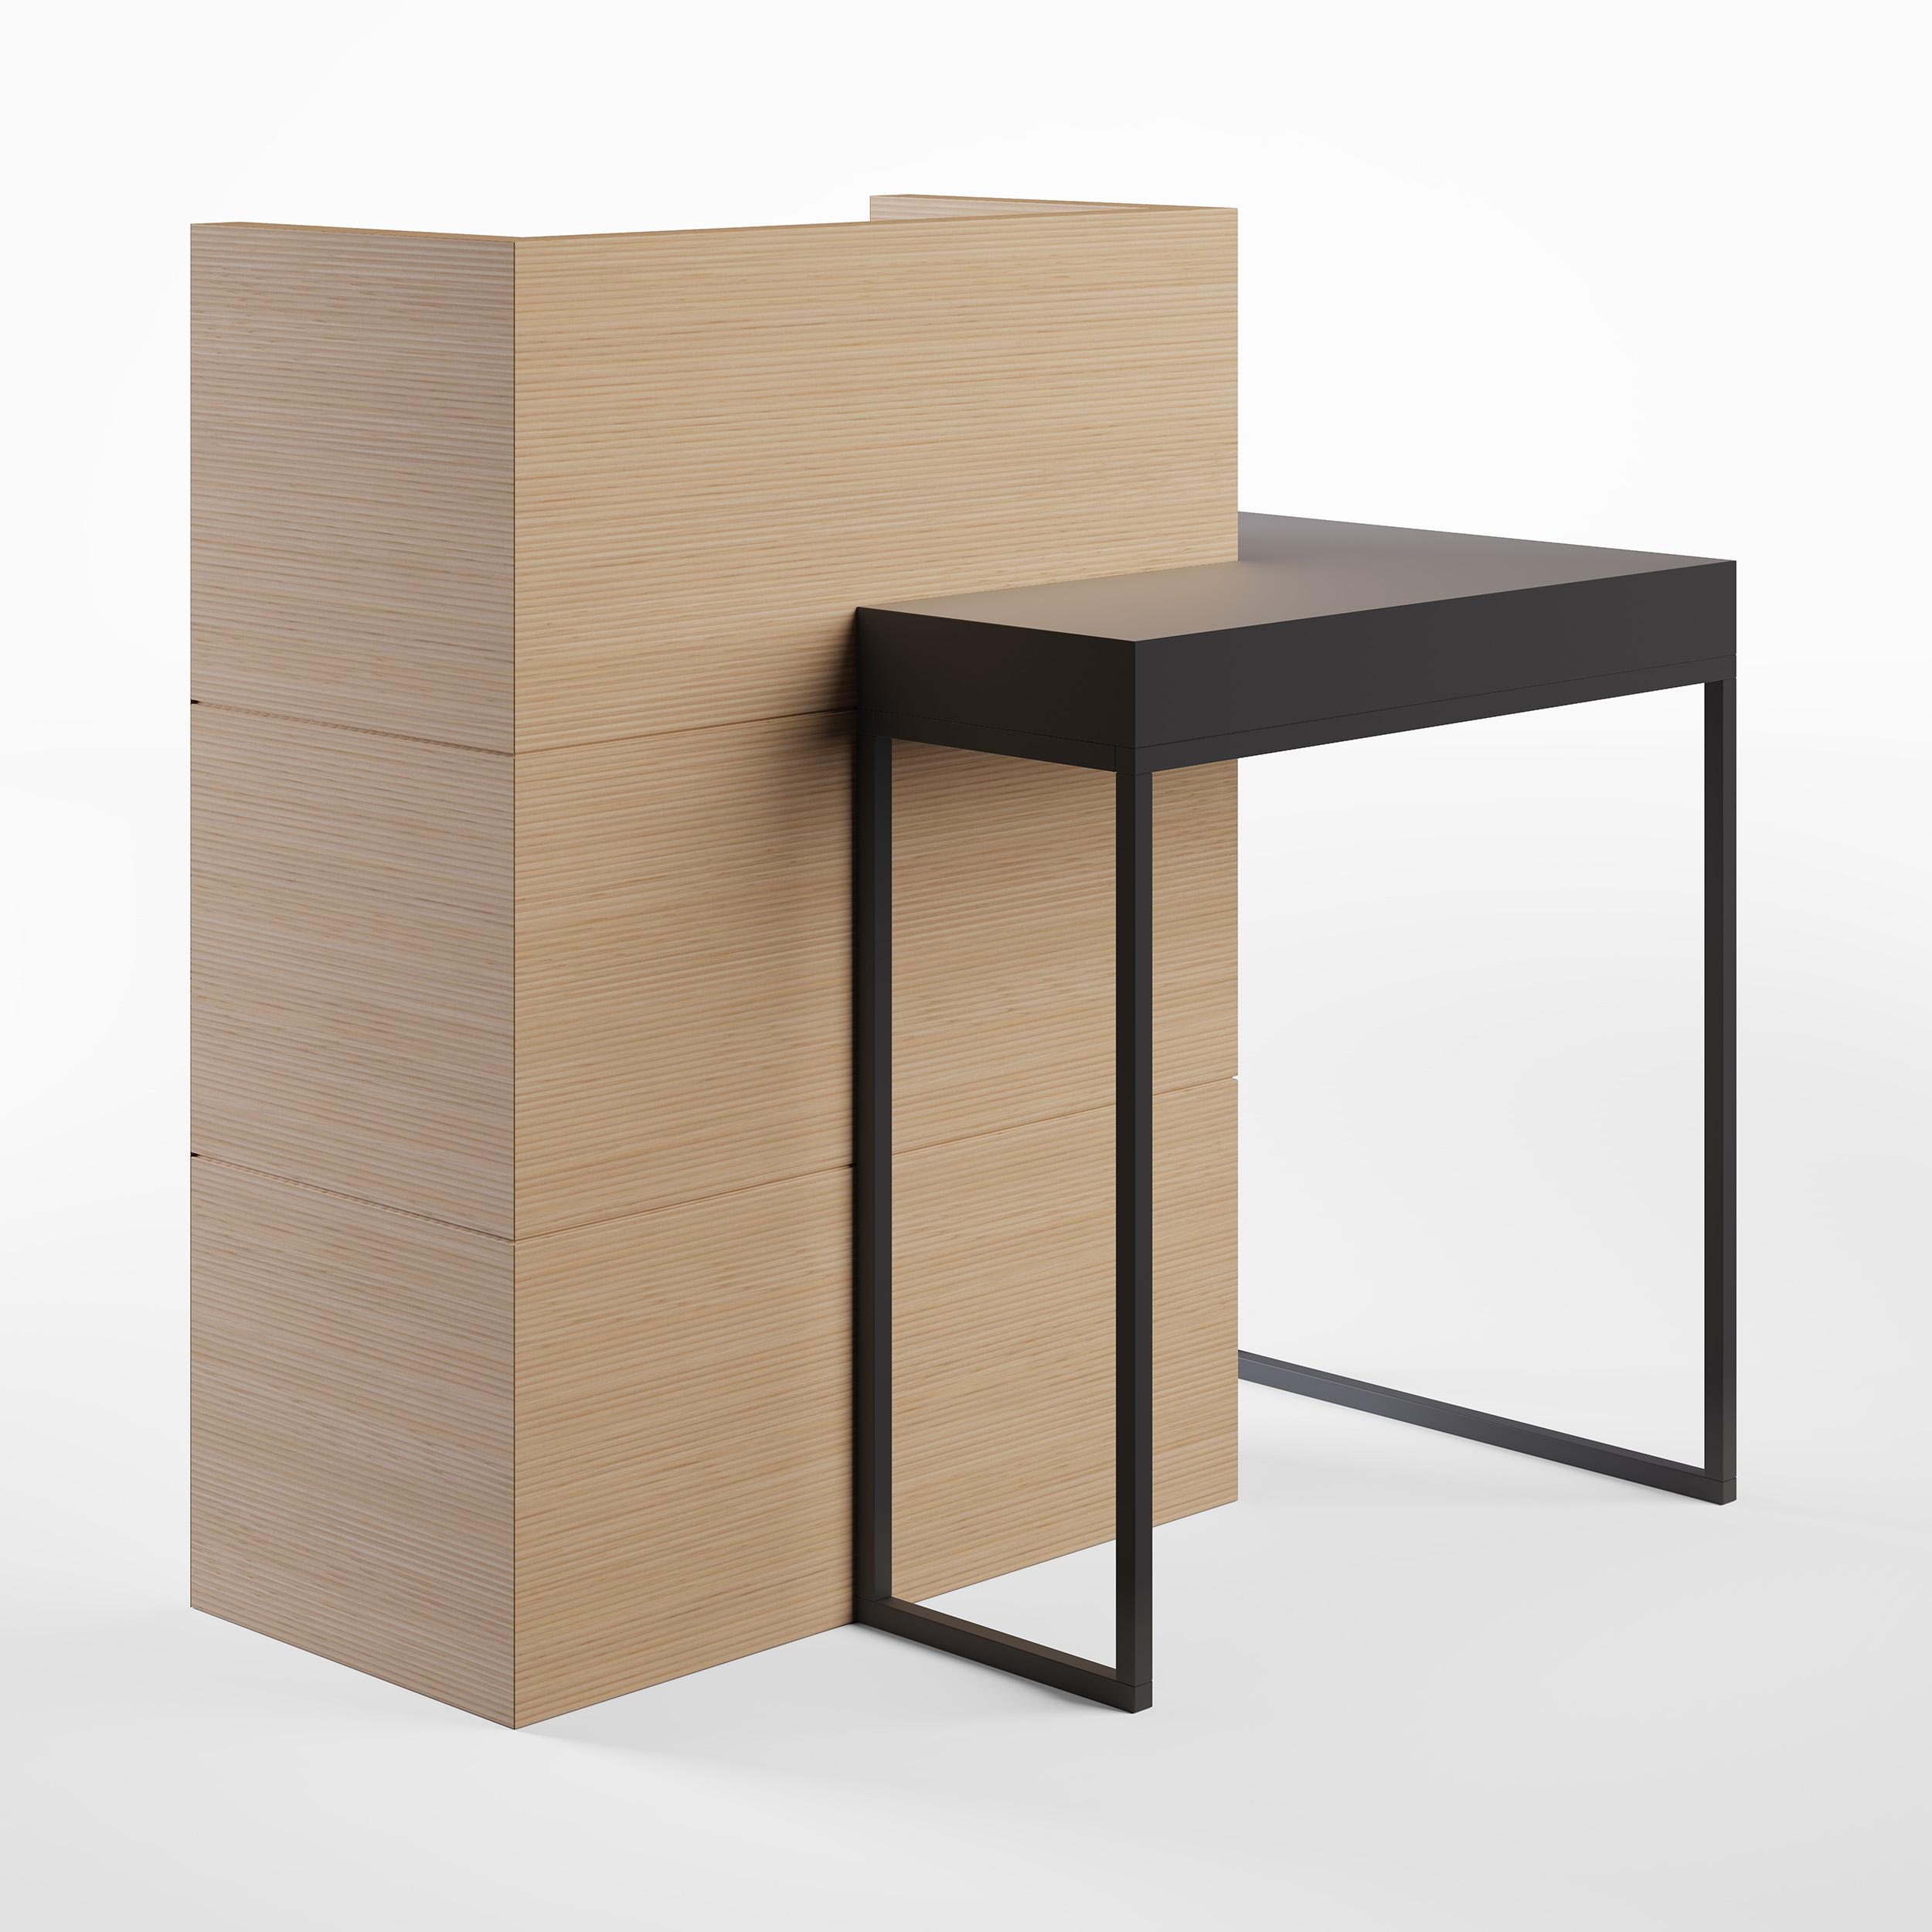 PHILOSOPHY_cash desk model 110_B copy.JPG